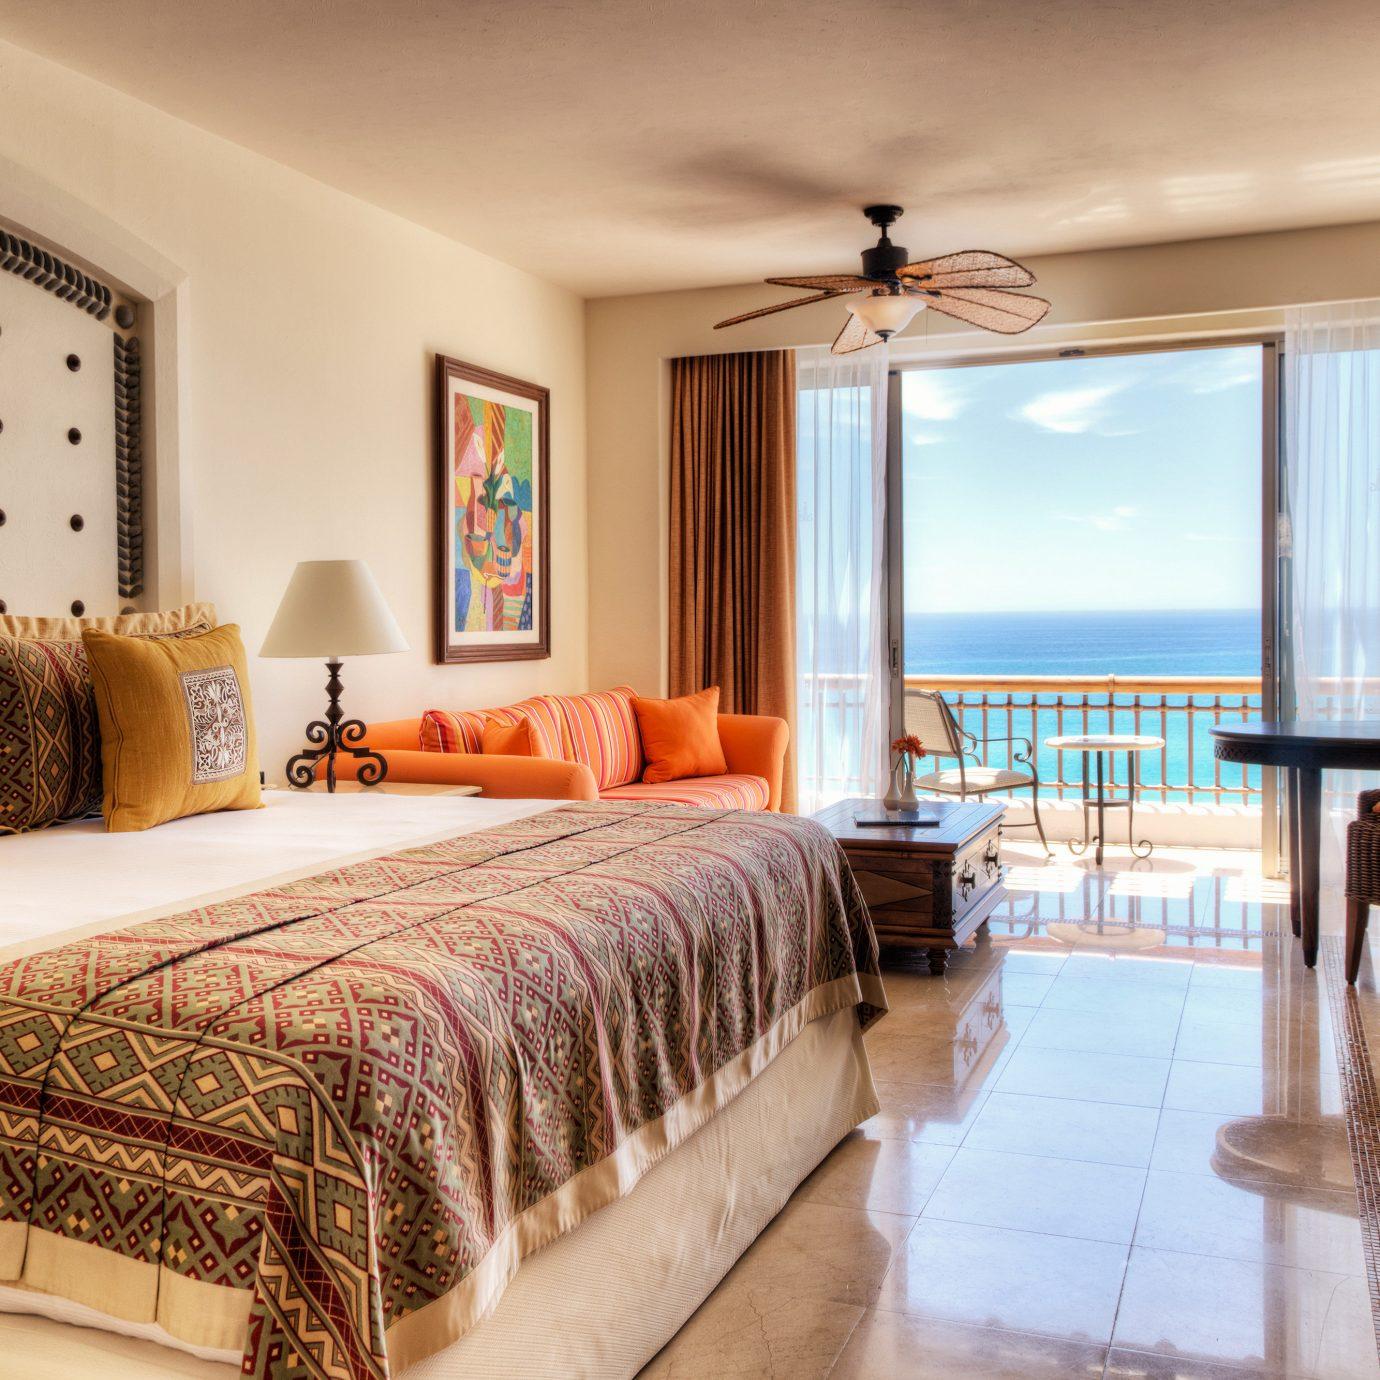 Balcony Bedroom Lounge Scenic views Suite sofa property Villa Resort cottage condominium living room mansion flat